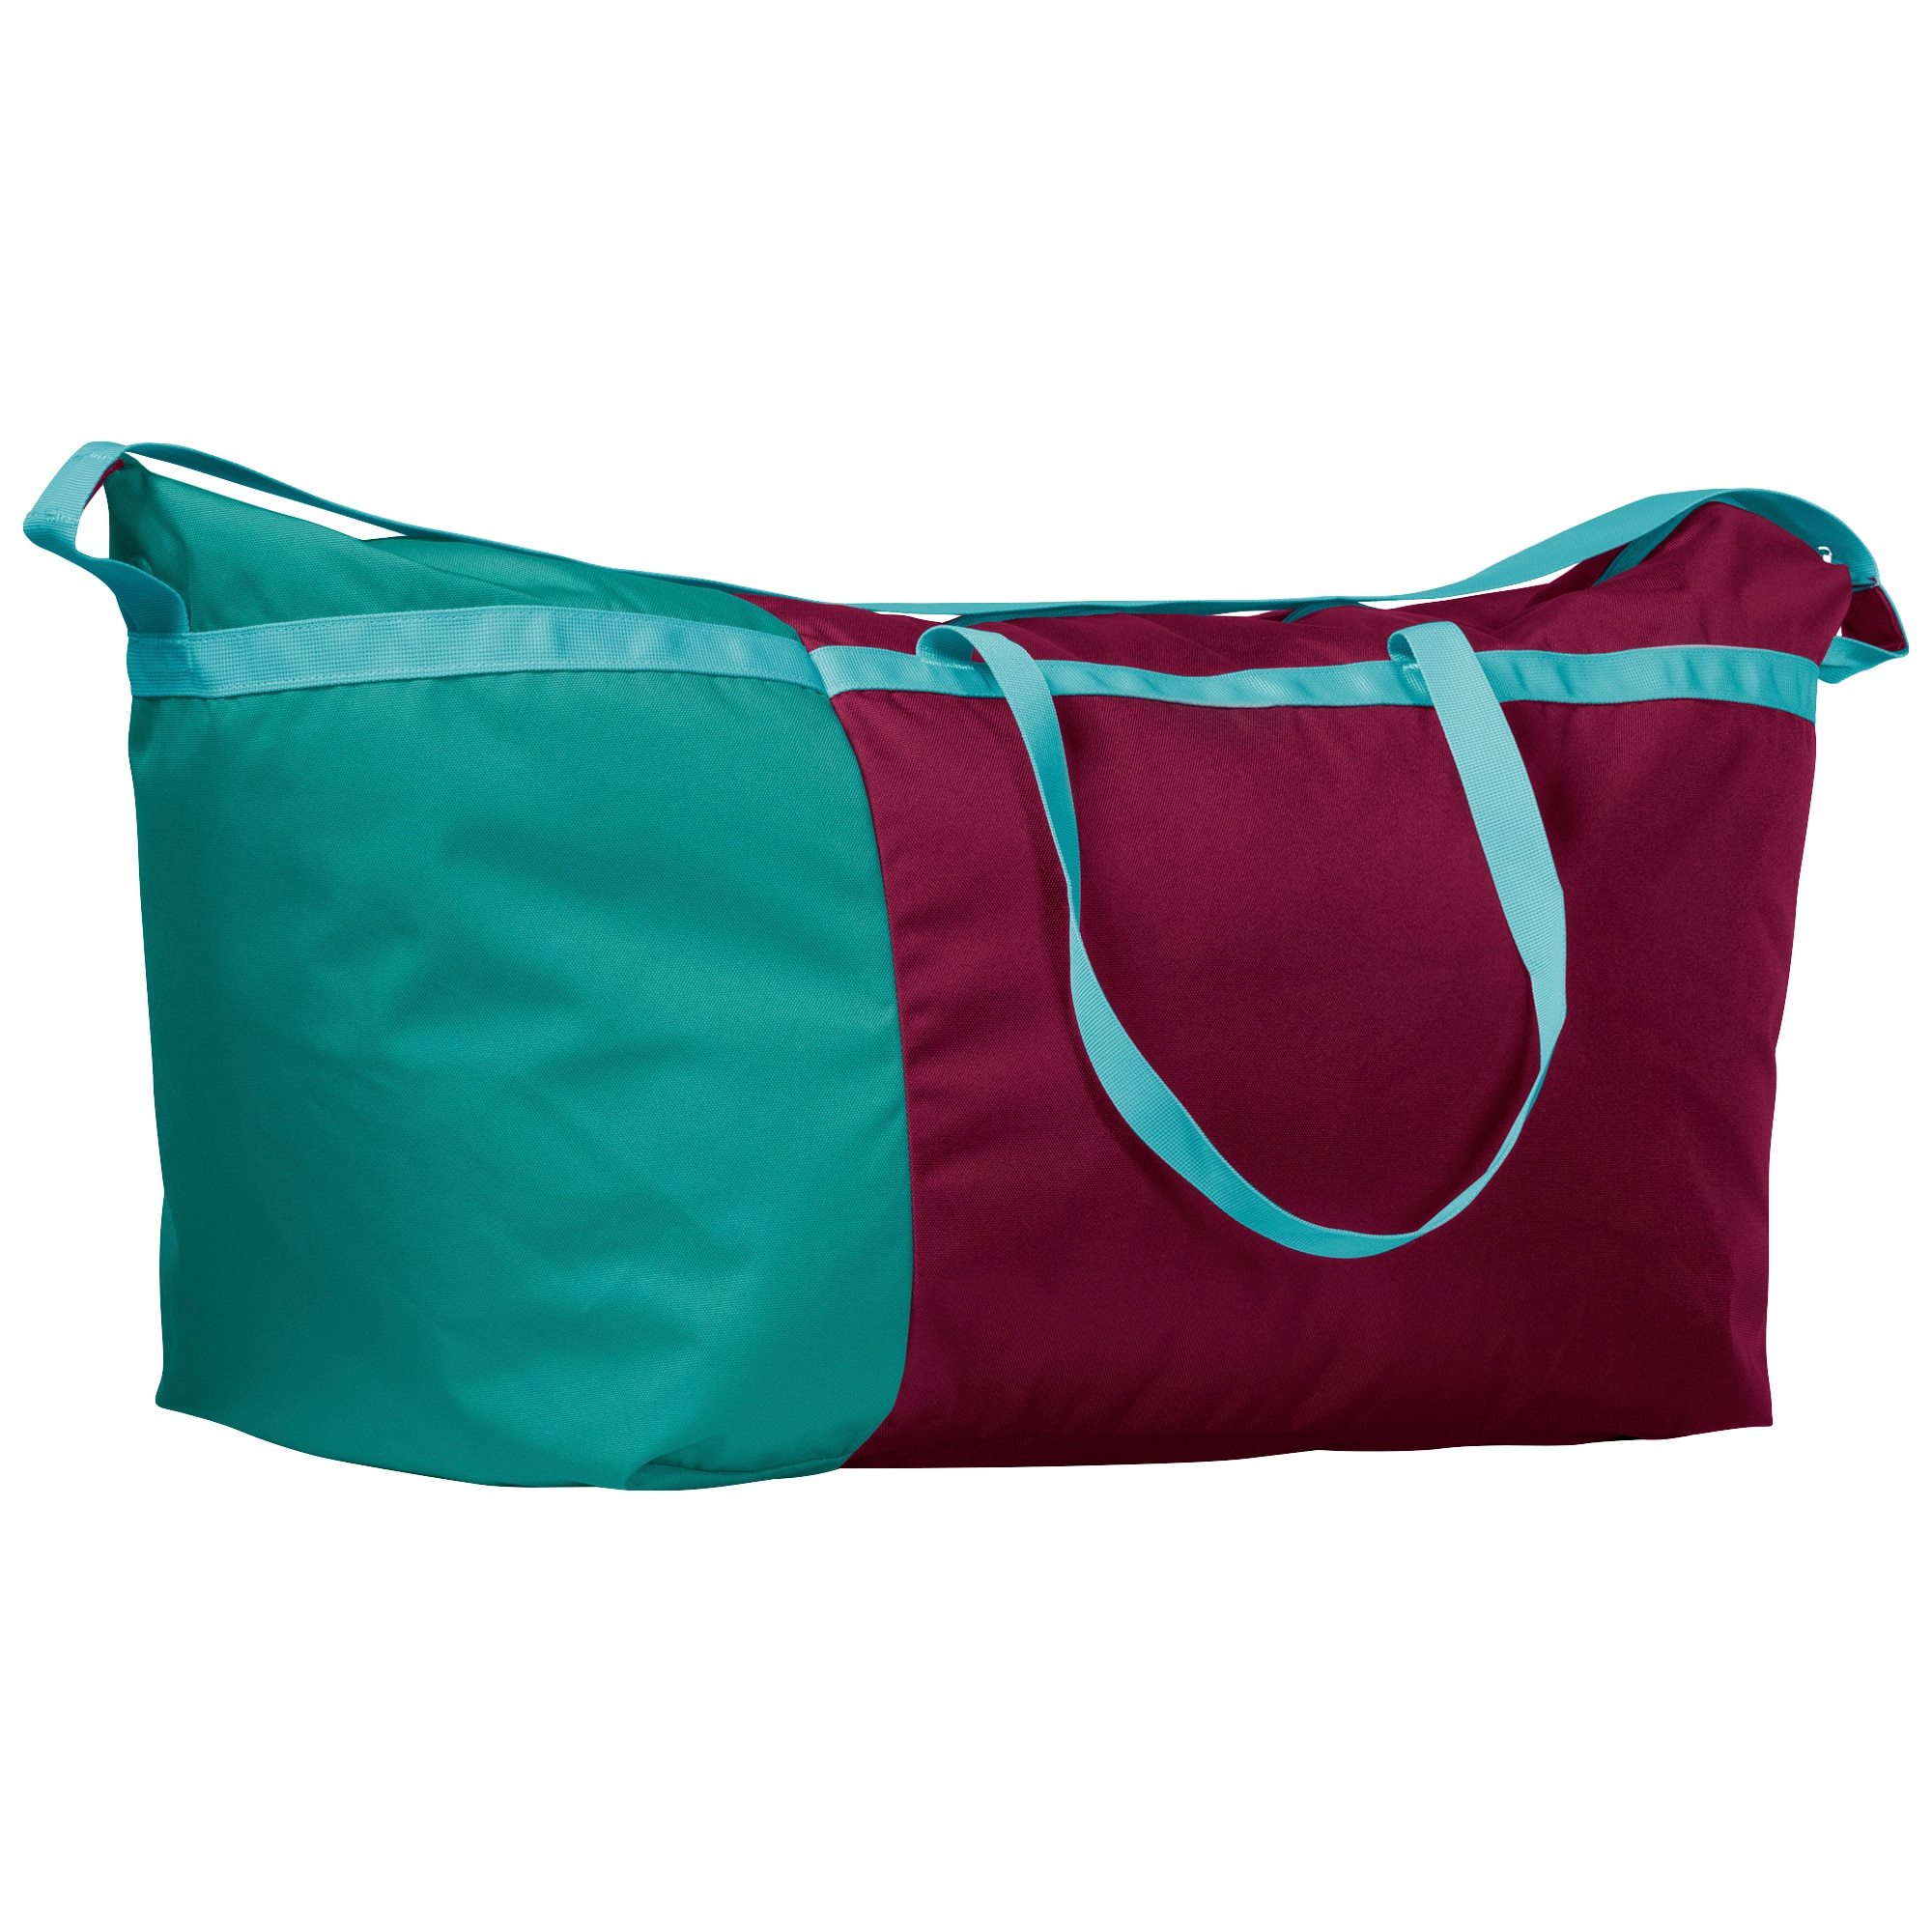 Vetlebotn Bag